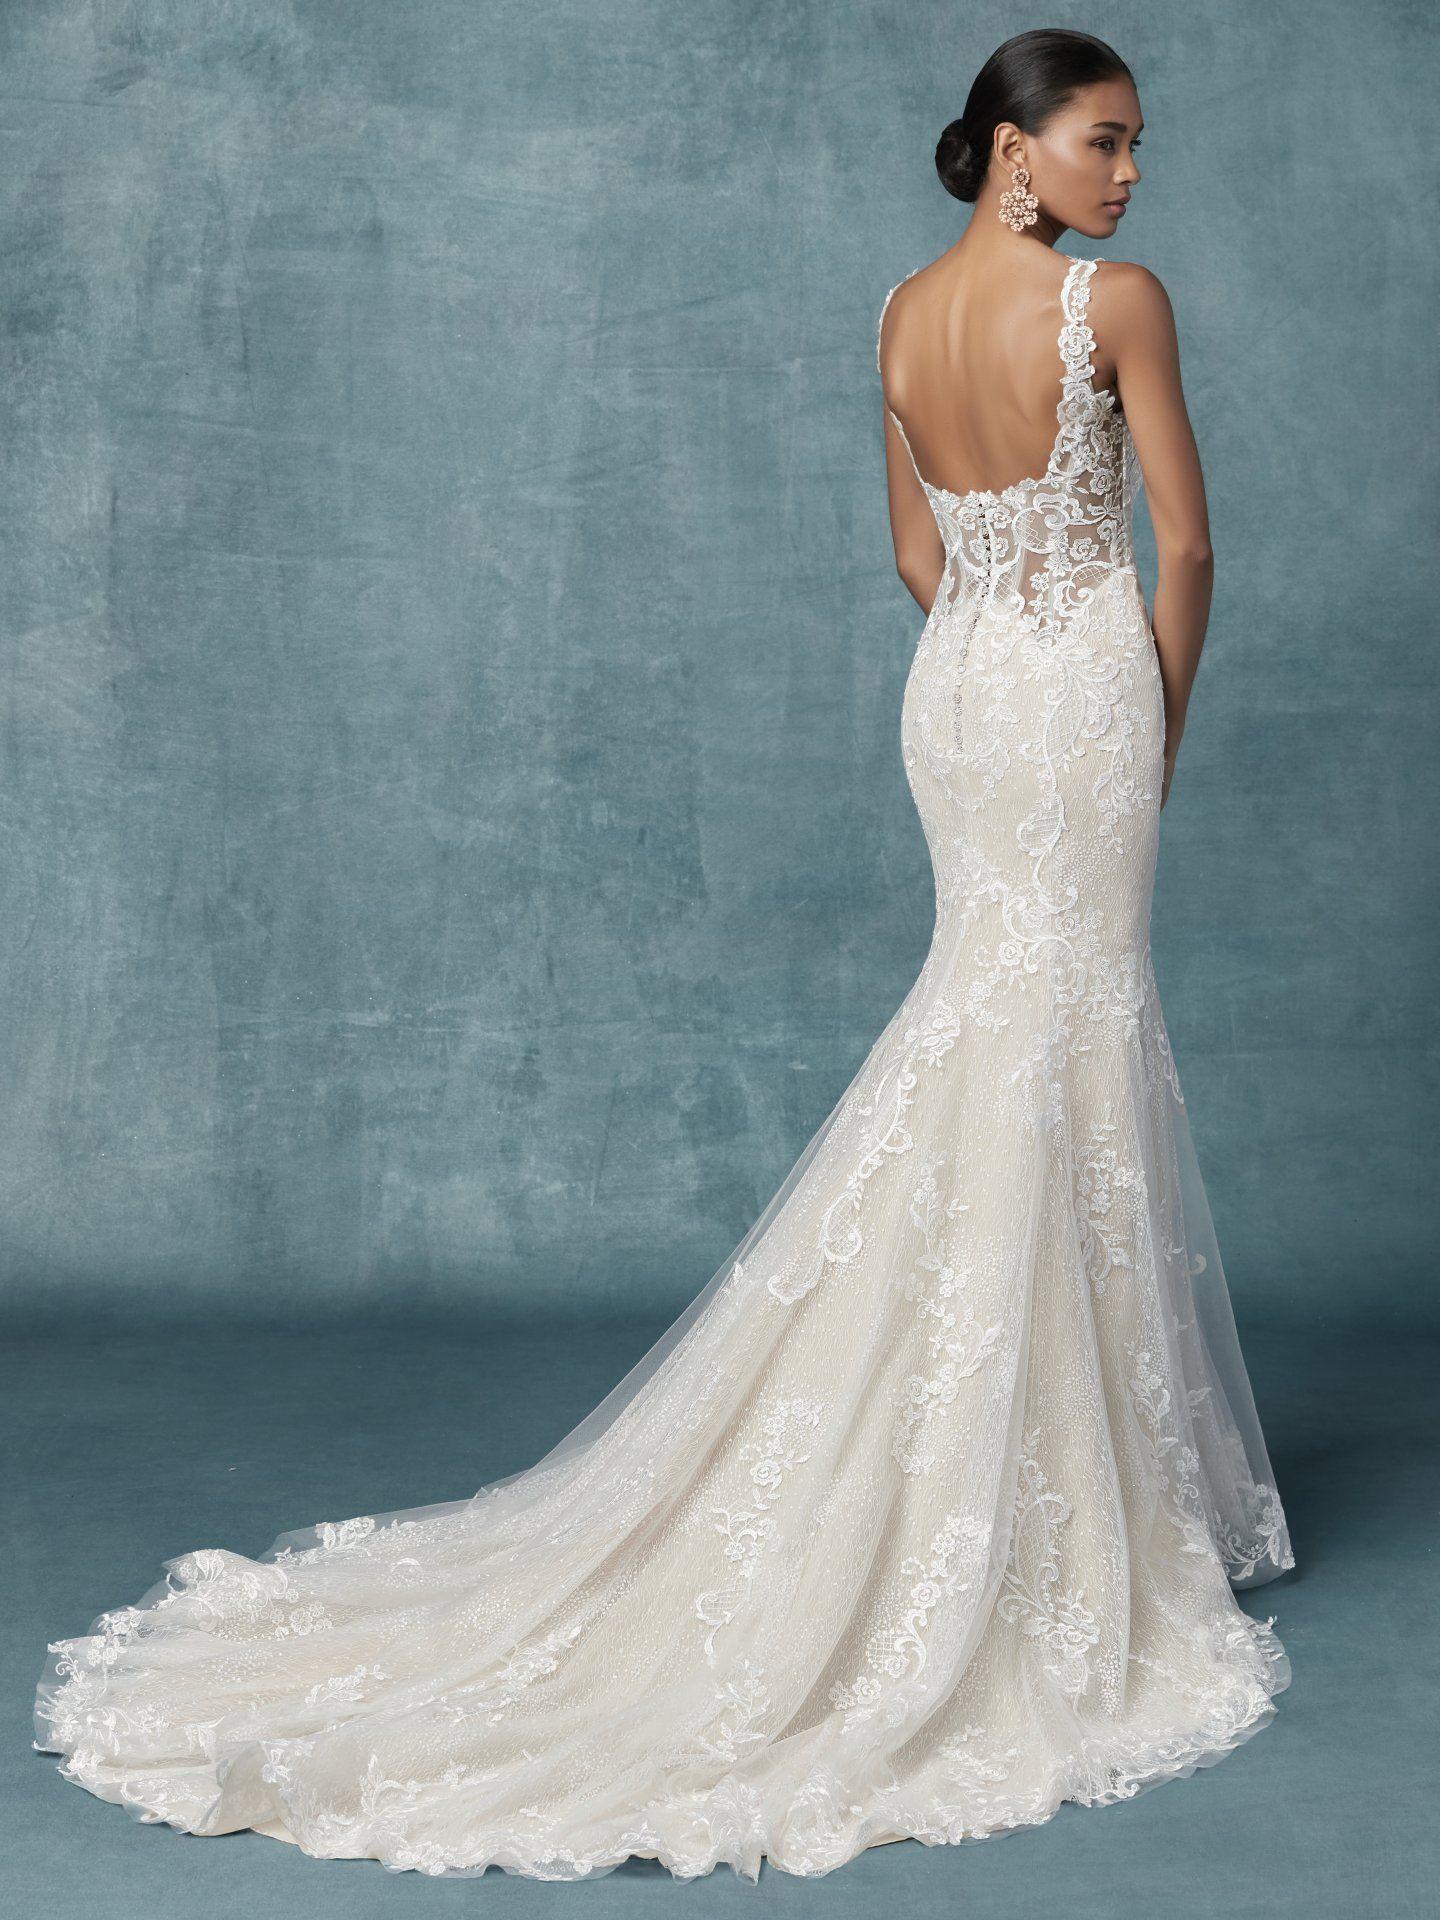 Wedding Dress Maggie Sottero Sottero Wedding Dress Black Wedding Guest Dresses Sequin Bridesmaid Dresses